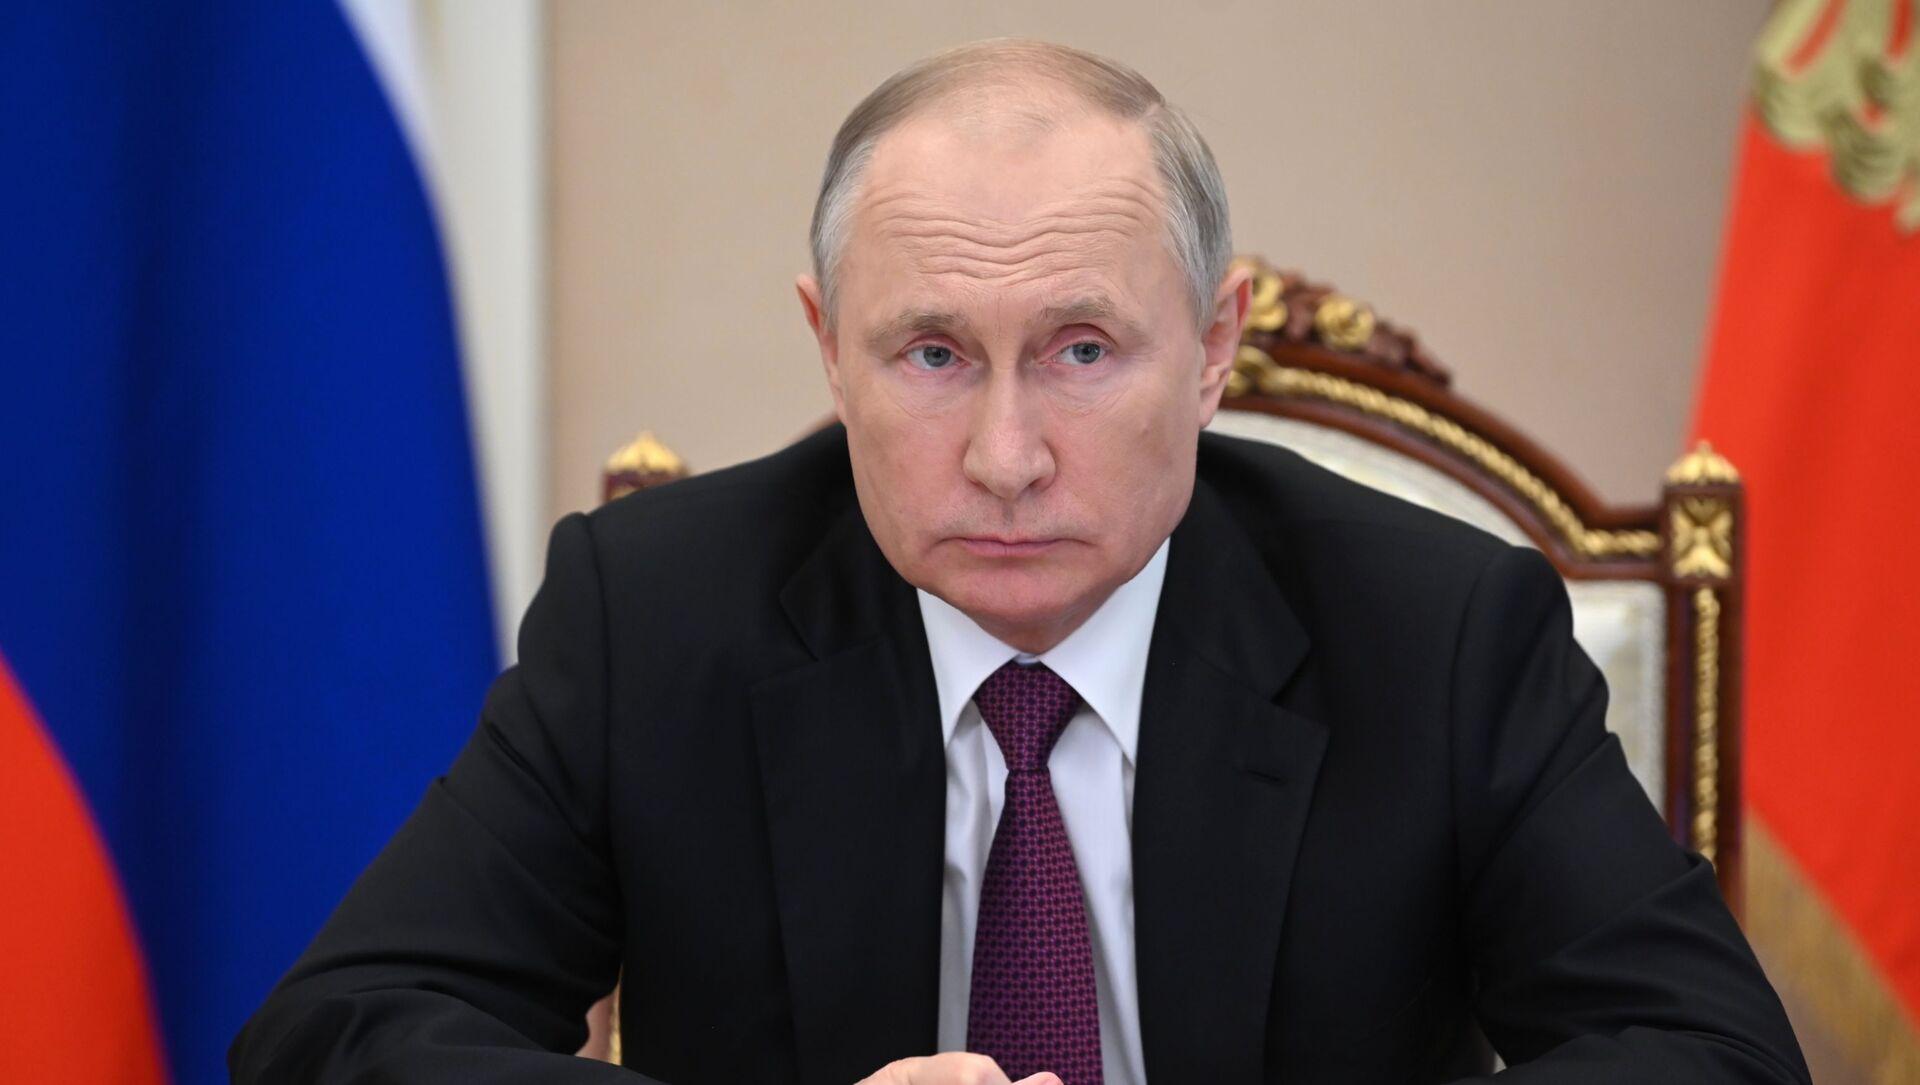 Tổng thống Nga Vladimir Putin - Sputnik Việt Nam, 1920, 22.08.2021